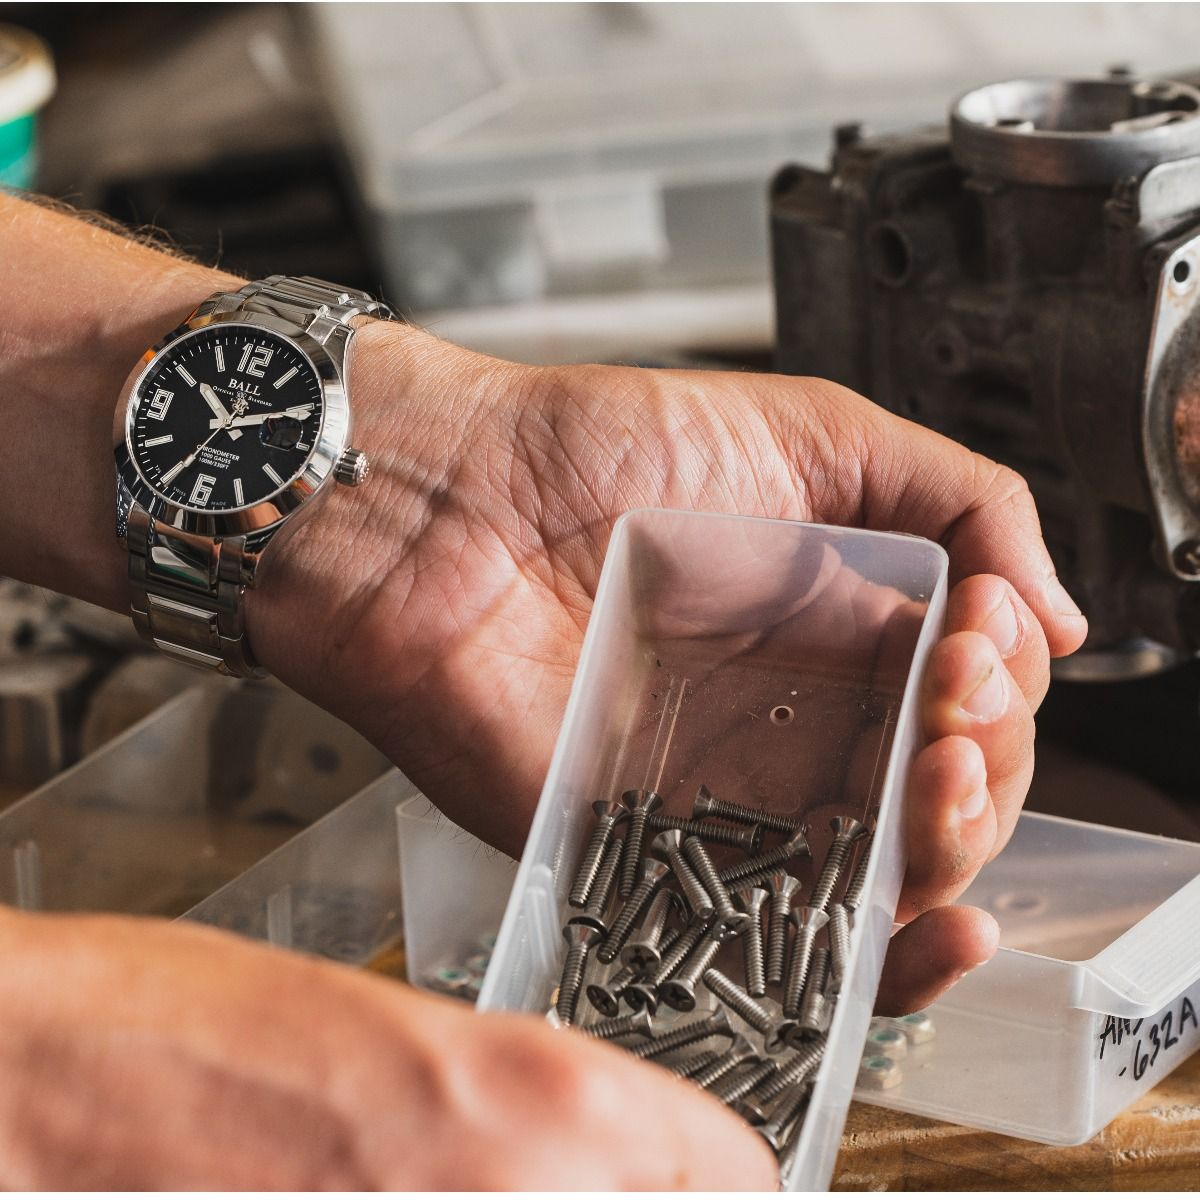 Zegarek męski Ball Engineer III Pioneer Automatic Chronometer